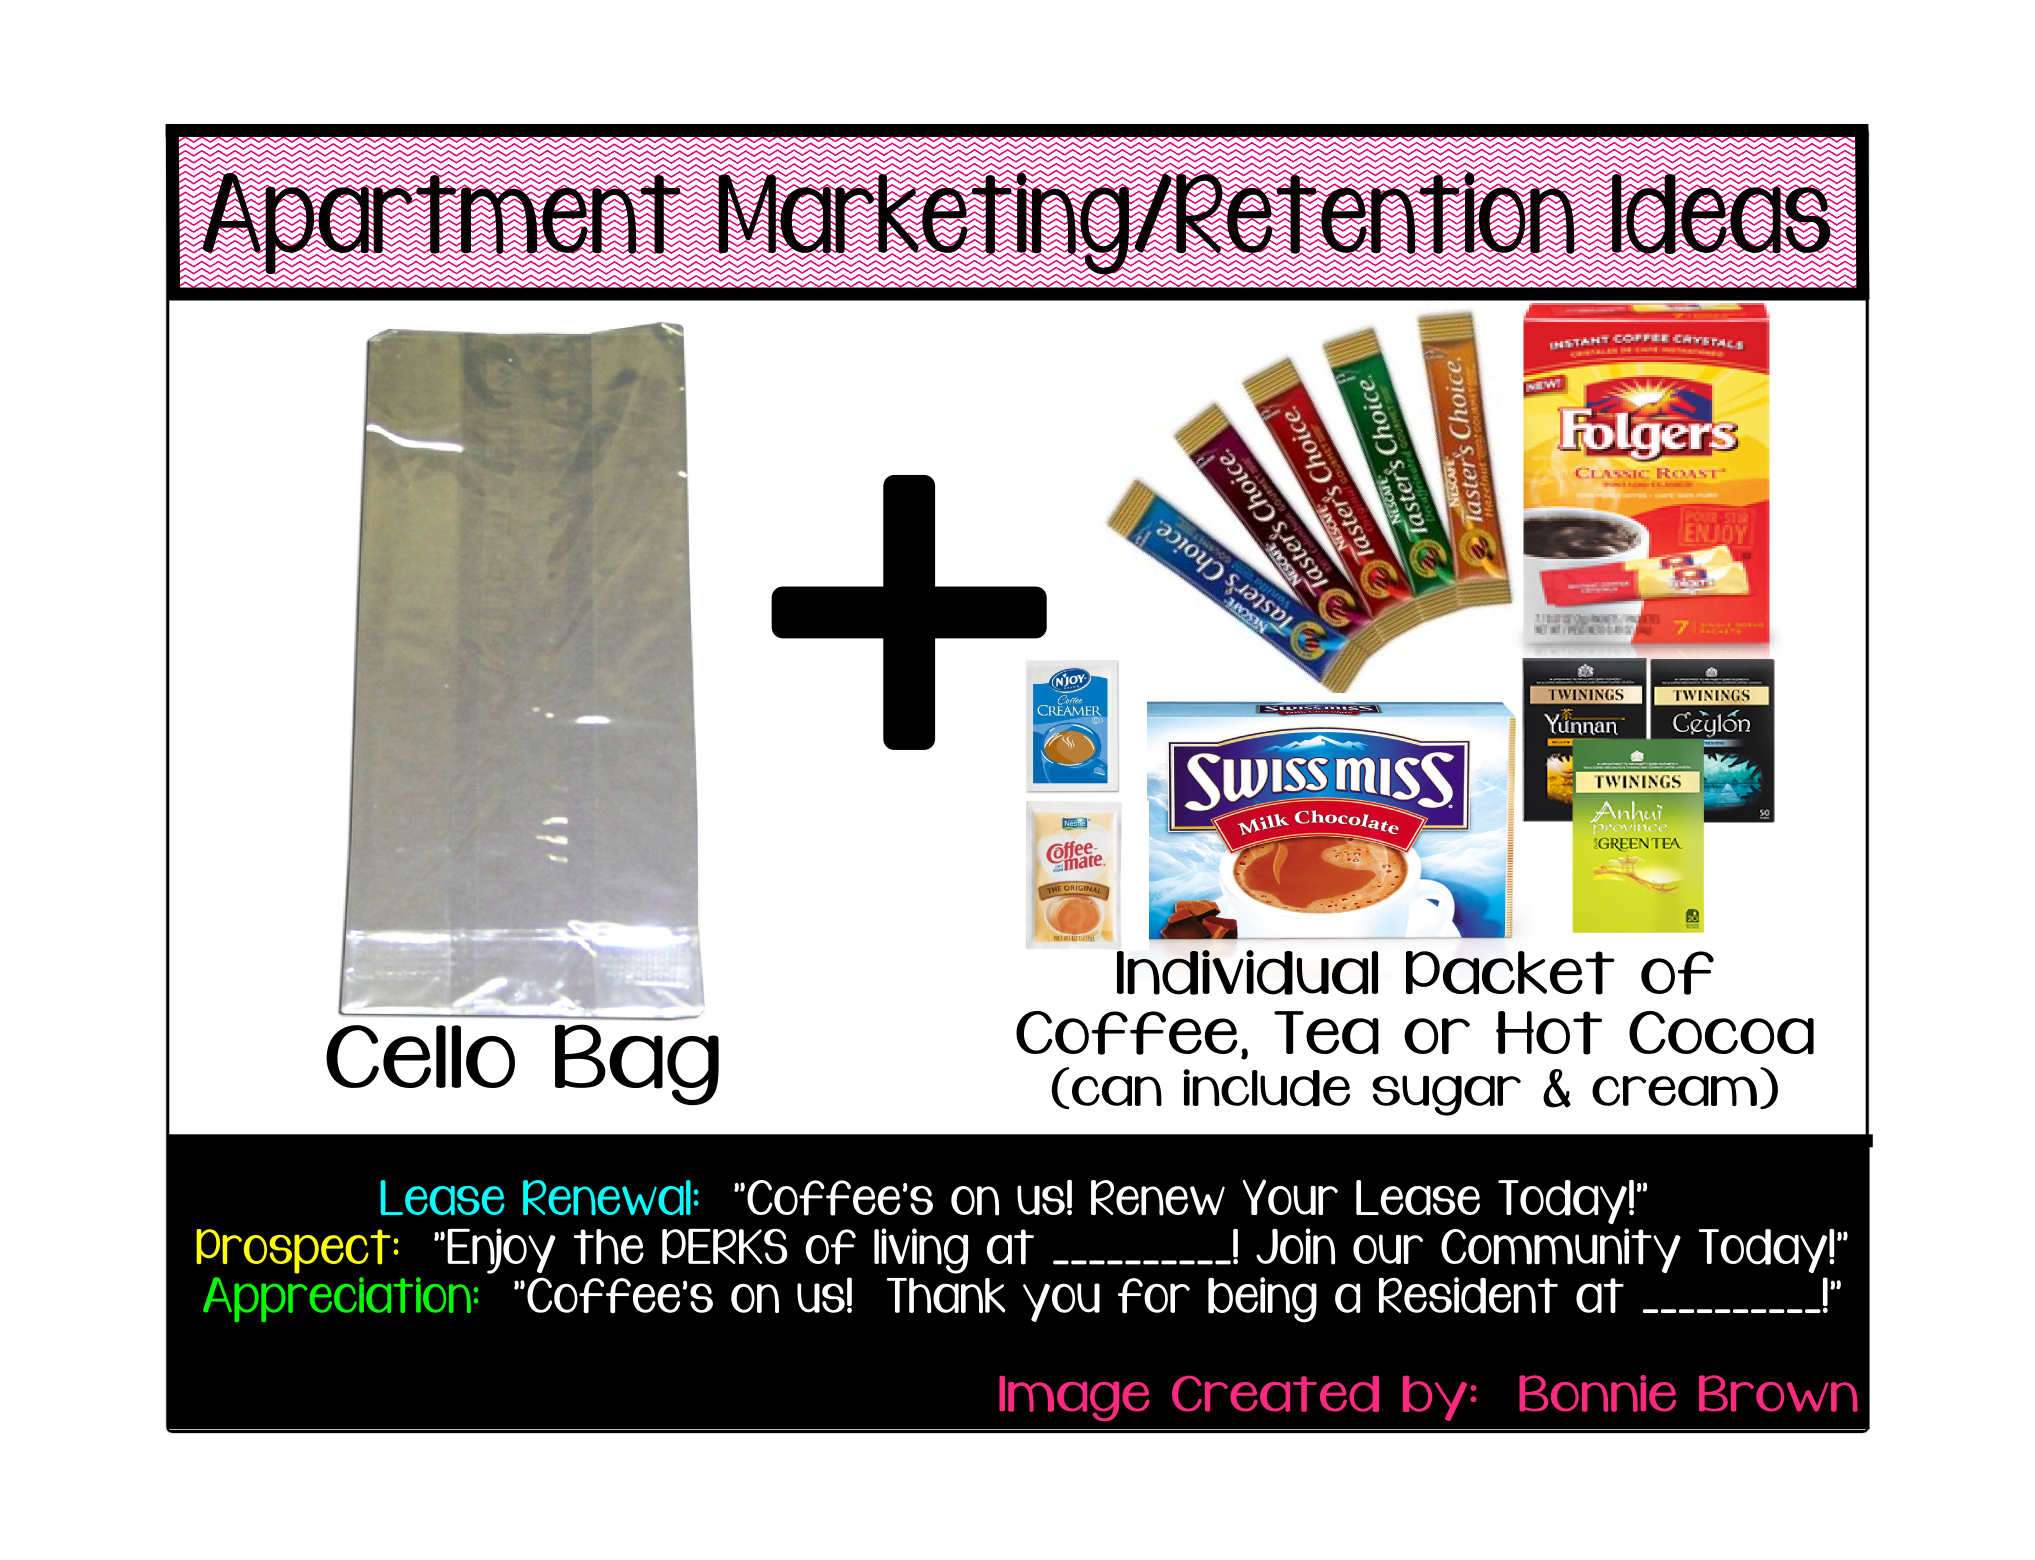 Apartment Marketing Retention Ideas Layout Designed By Bonnie